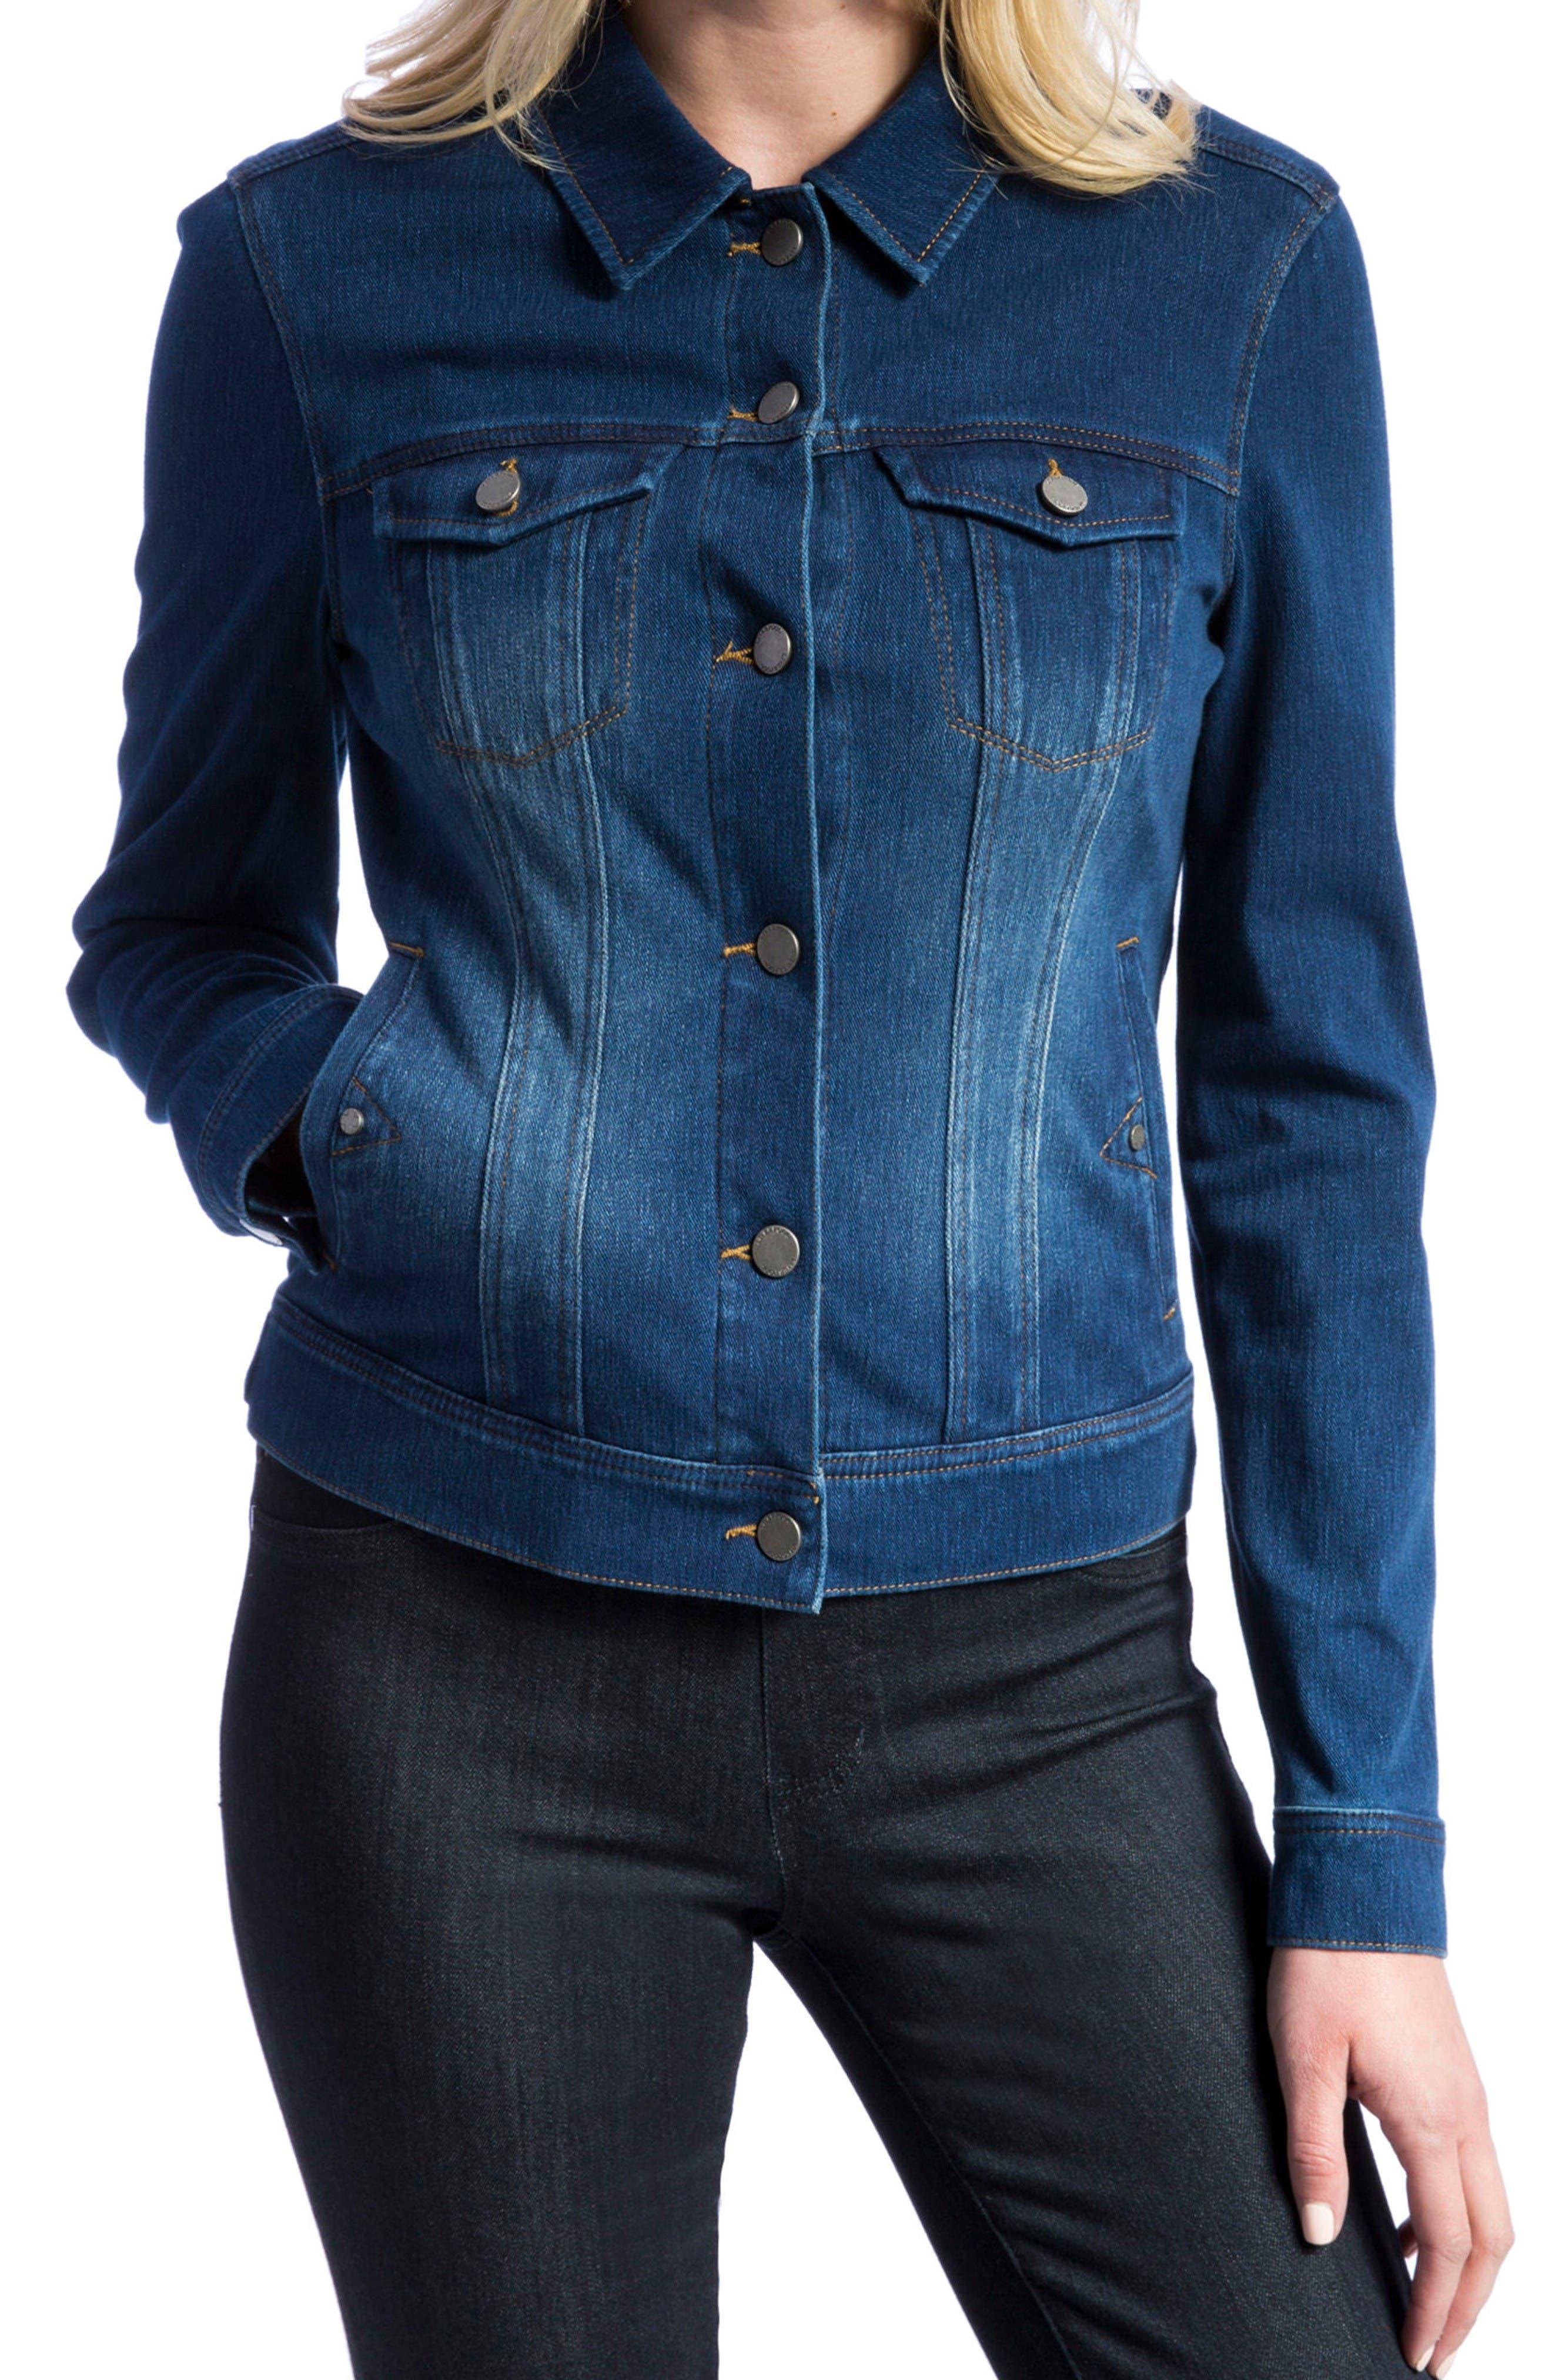 Main Image - Liverpool Jeans Company Knit Denim Jacket (Petite)